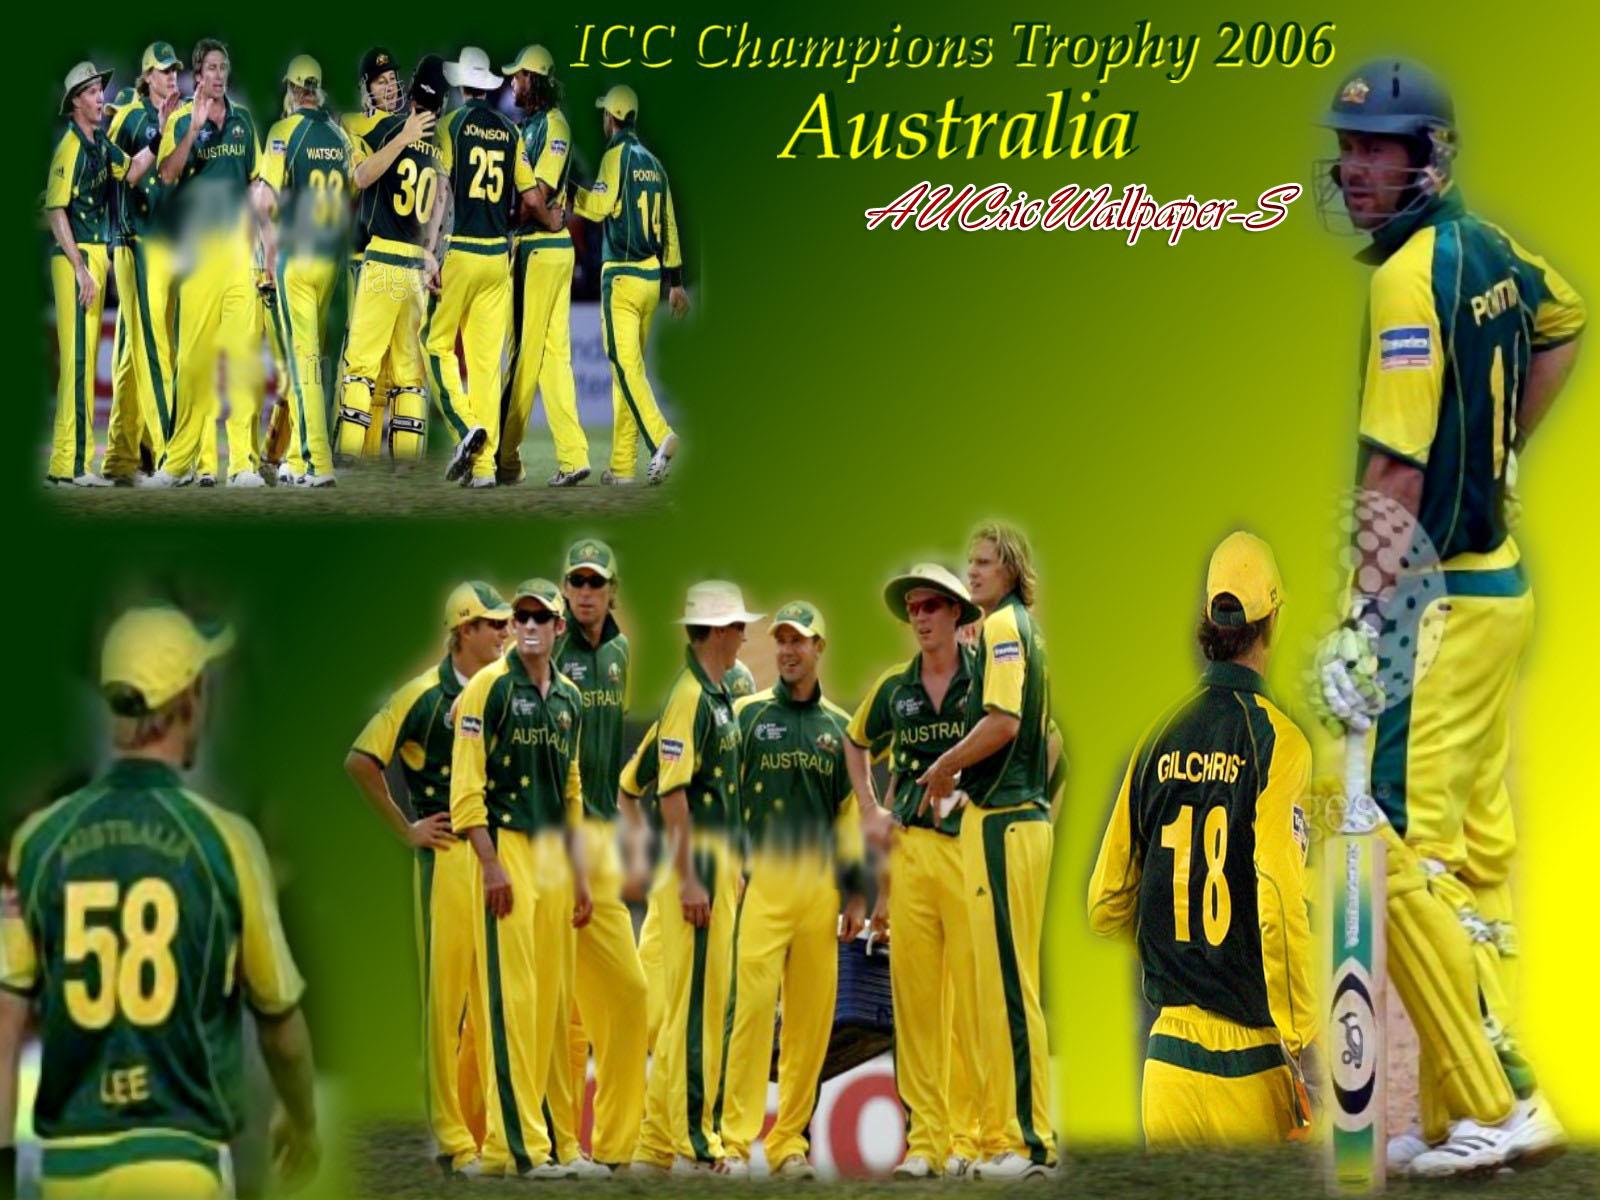 http://1.bp.blogspot.com/_7WMC8wh8IAI/TREwiLgeSKI/AAAAAAAAAIU/9ZznyG5UhFs/s1600/Australia+Cricket+Wallpaper+%252812%2529.jpg